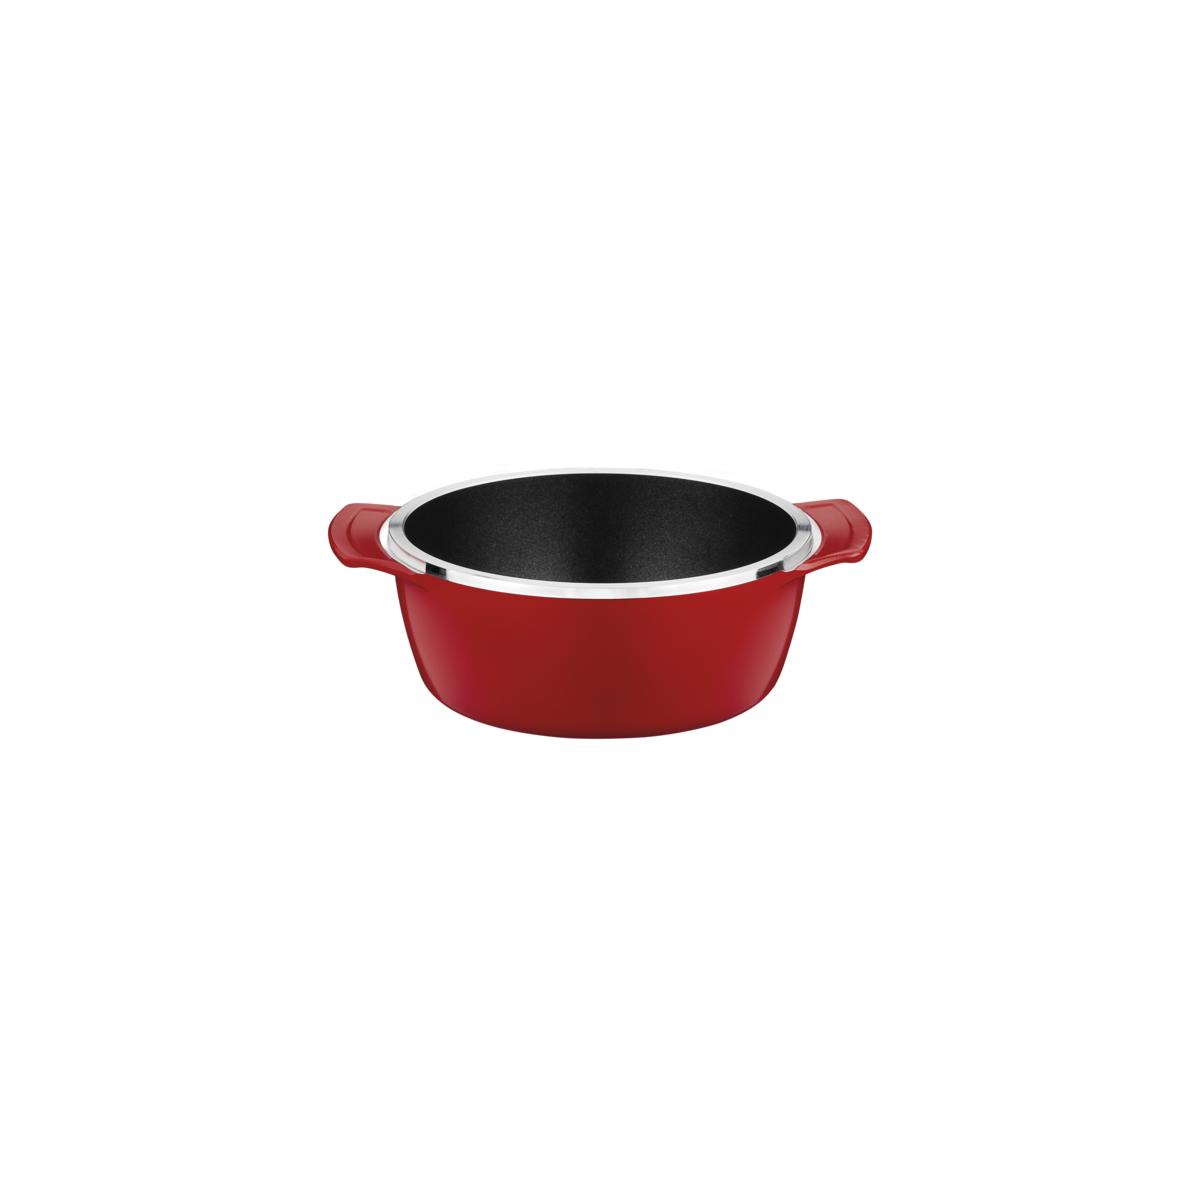 O 10 Cm Mini Casserole Dish Tramontina